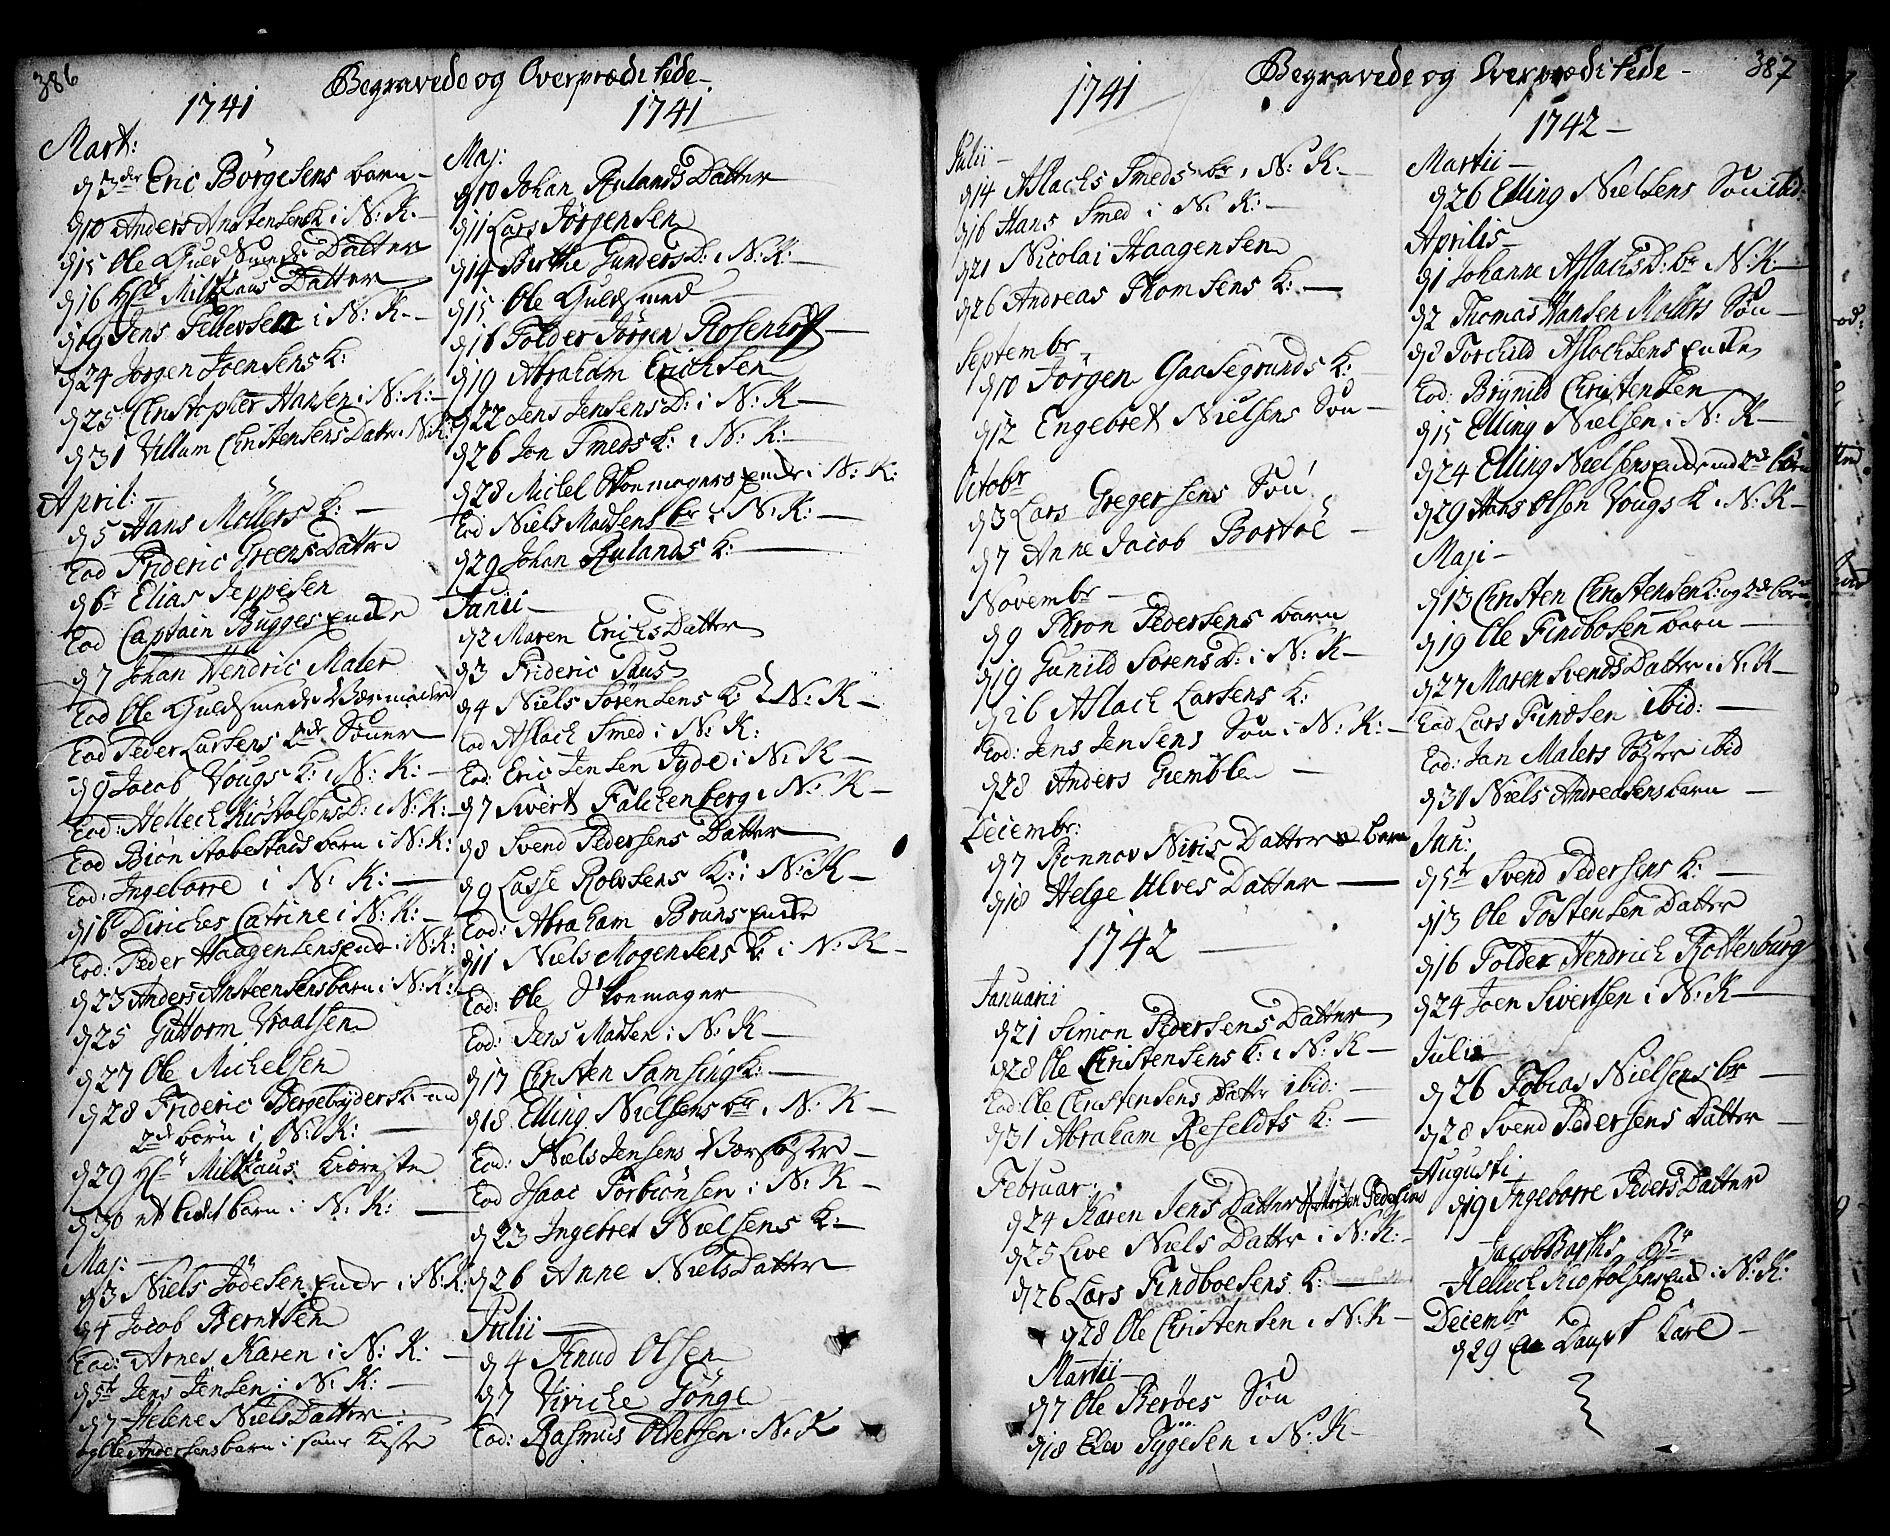 SAKO, Kragerø kirkebøker, F/Fa/L0001: Ministerialbok nr. 1, 1702-1766, s. 386-387